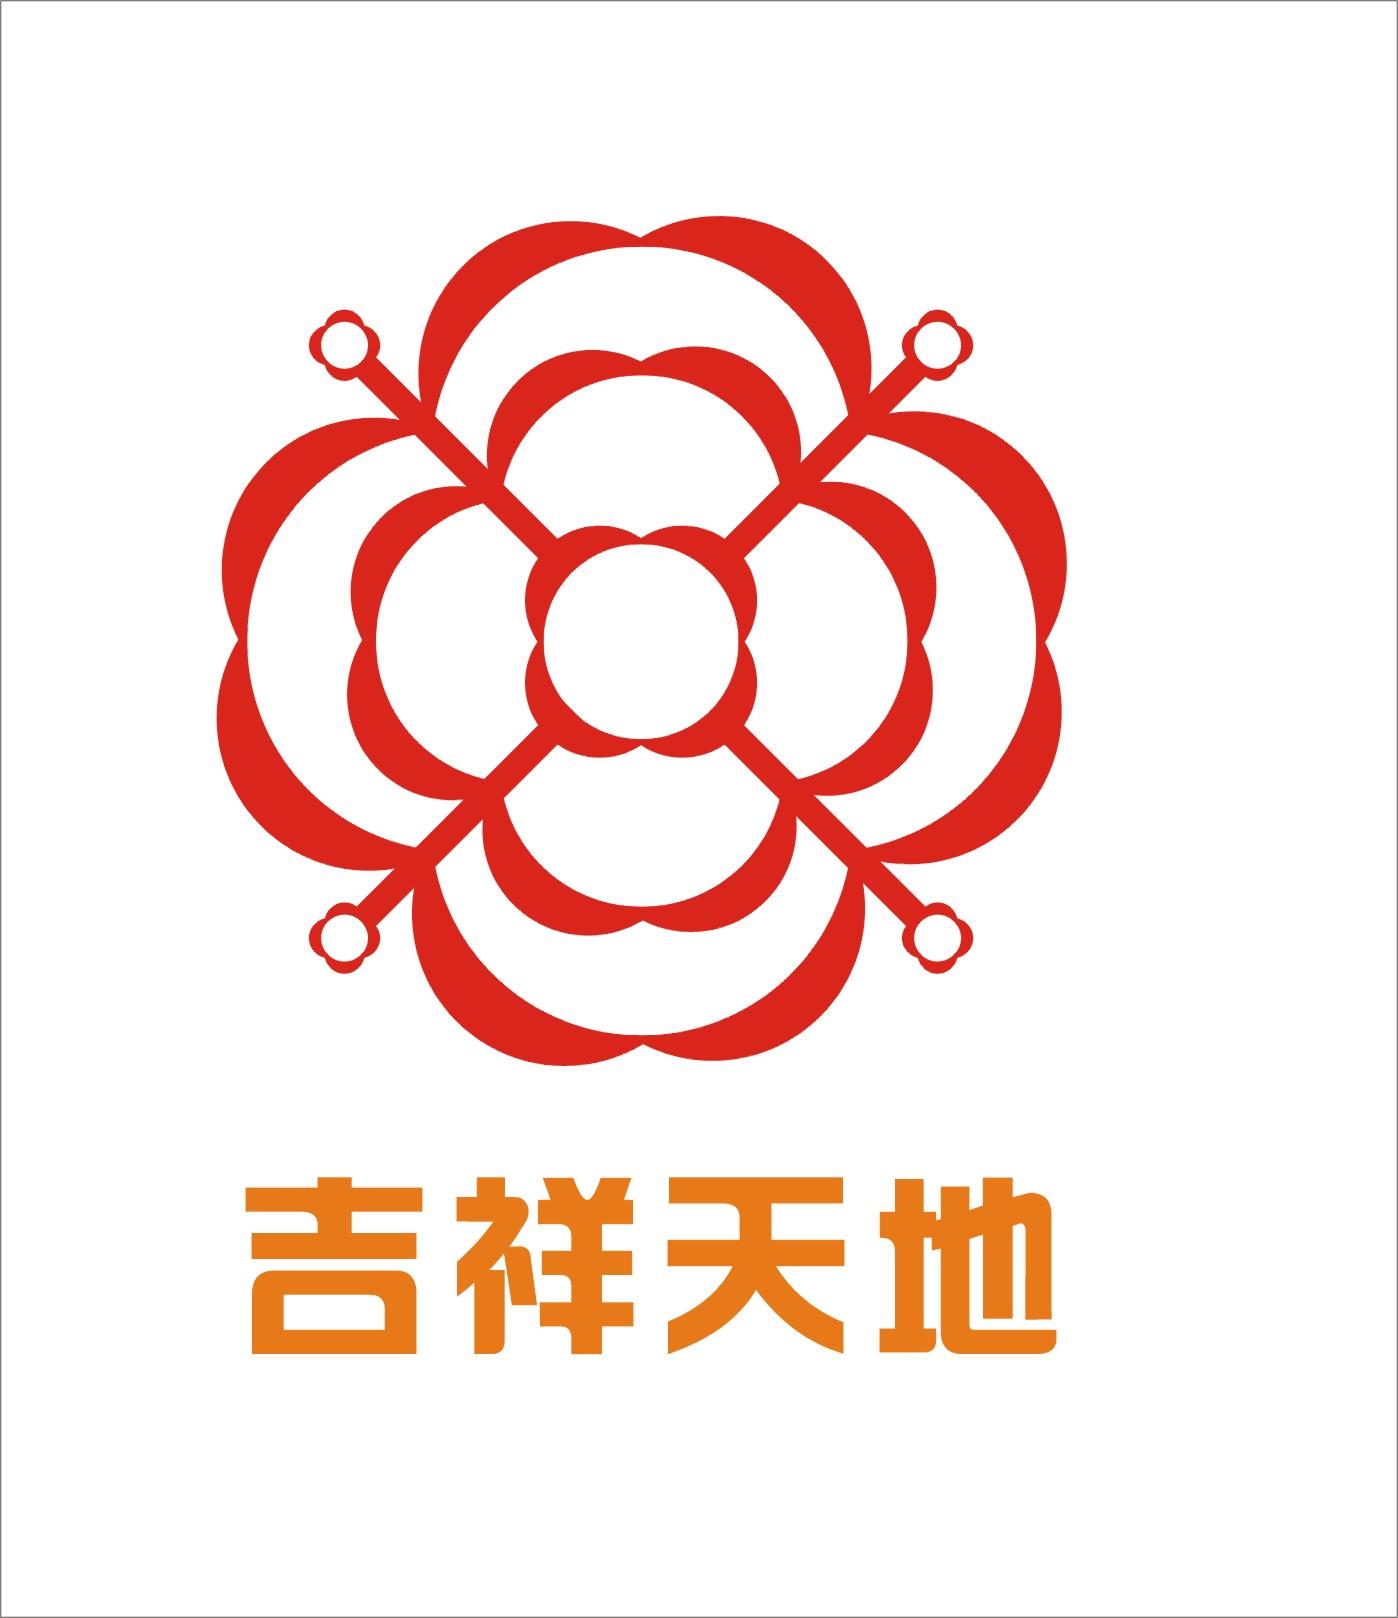 logo logo 标志 设计 图标 1398_1618